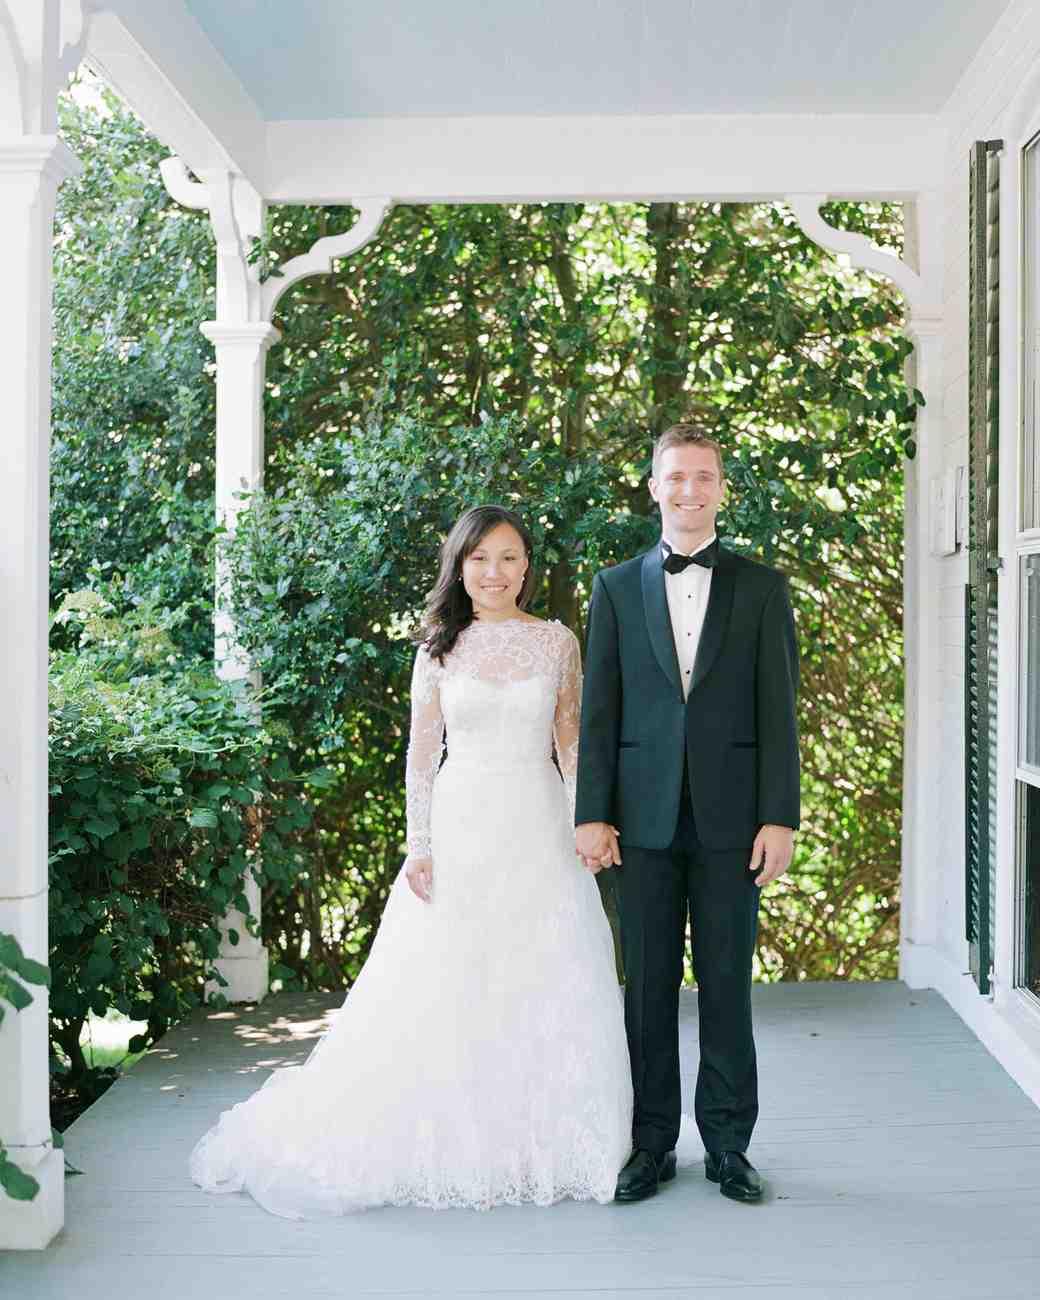 lissy-steven-wedding-newport-couple-76-elizabethmessina-s112907-0516.jpg